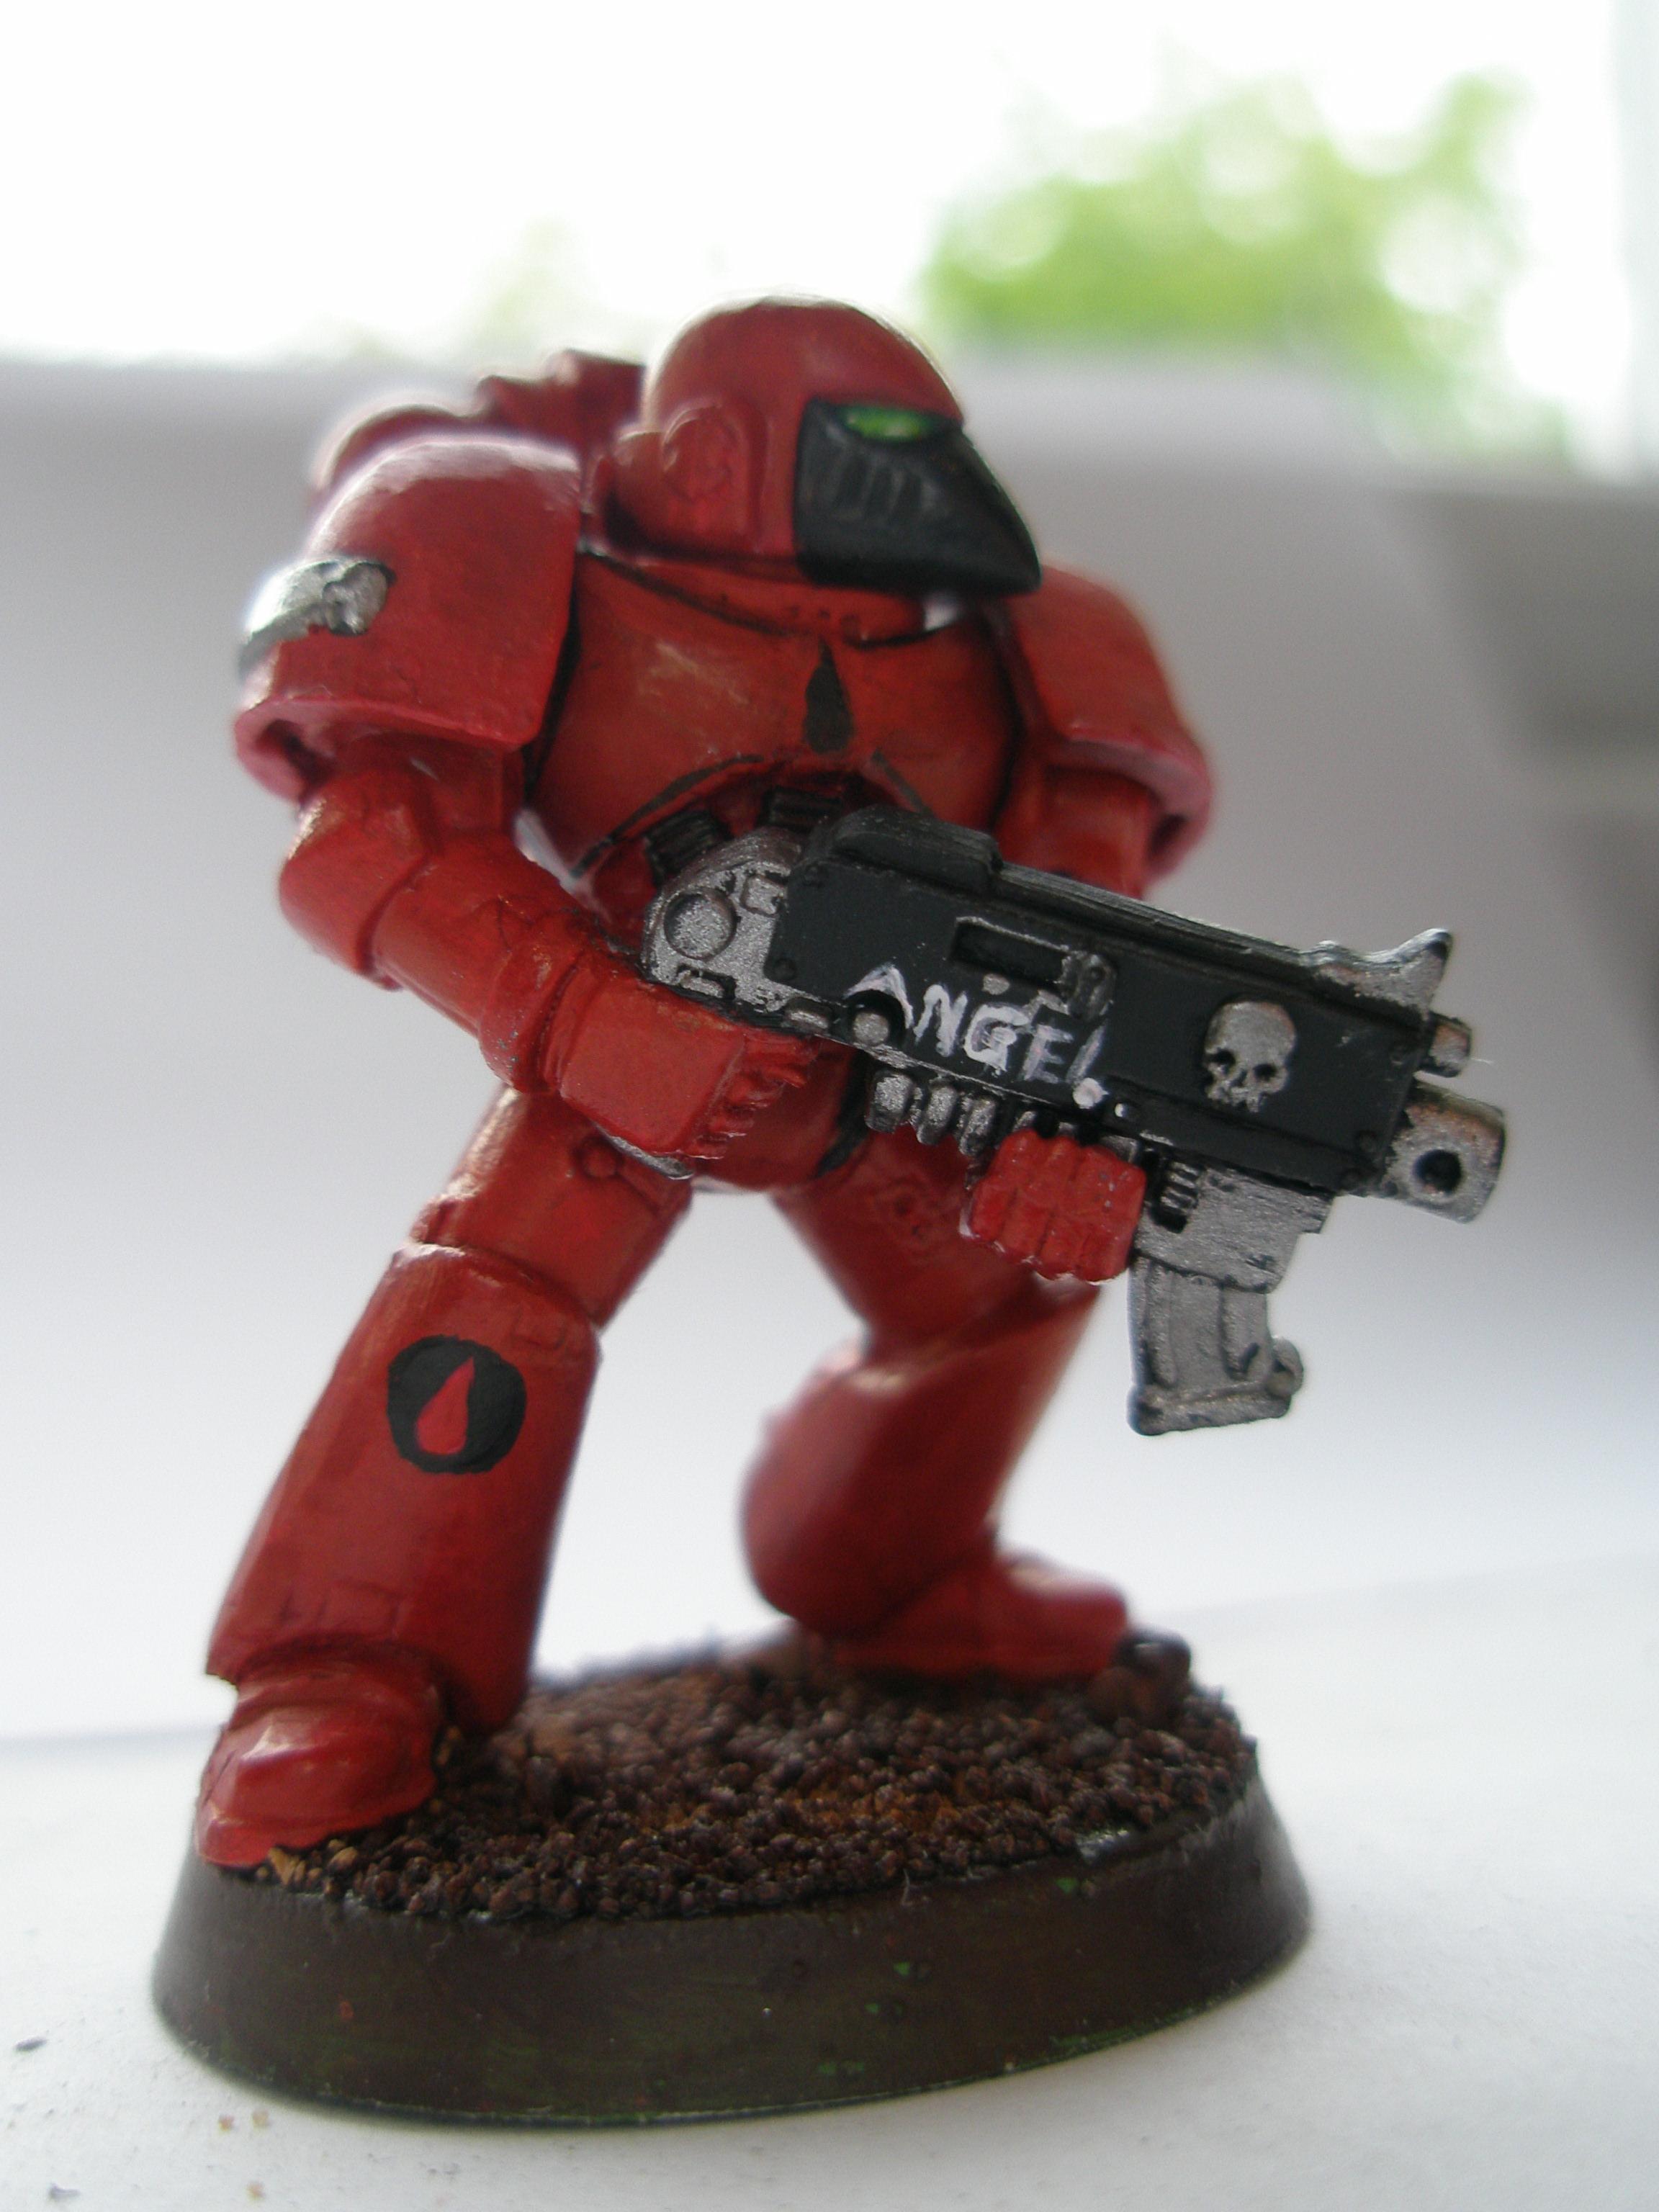 40 000, Angel, Blood, Space, Space Marines, Warhammer 40,000